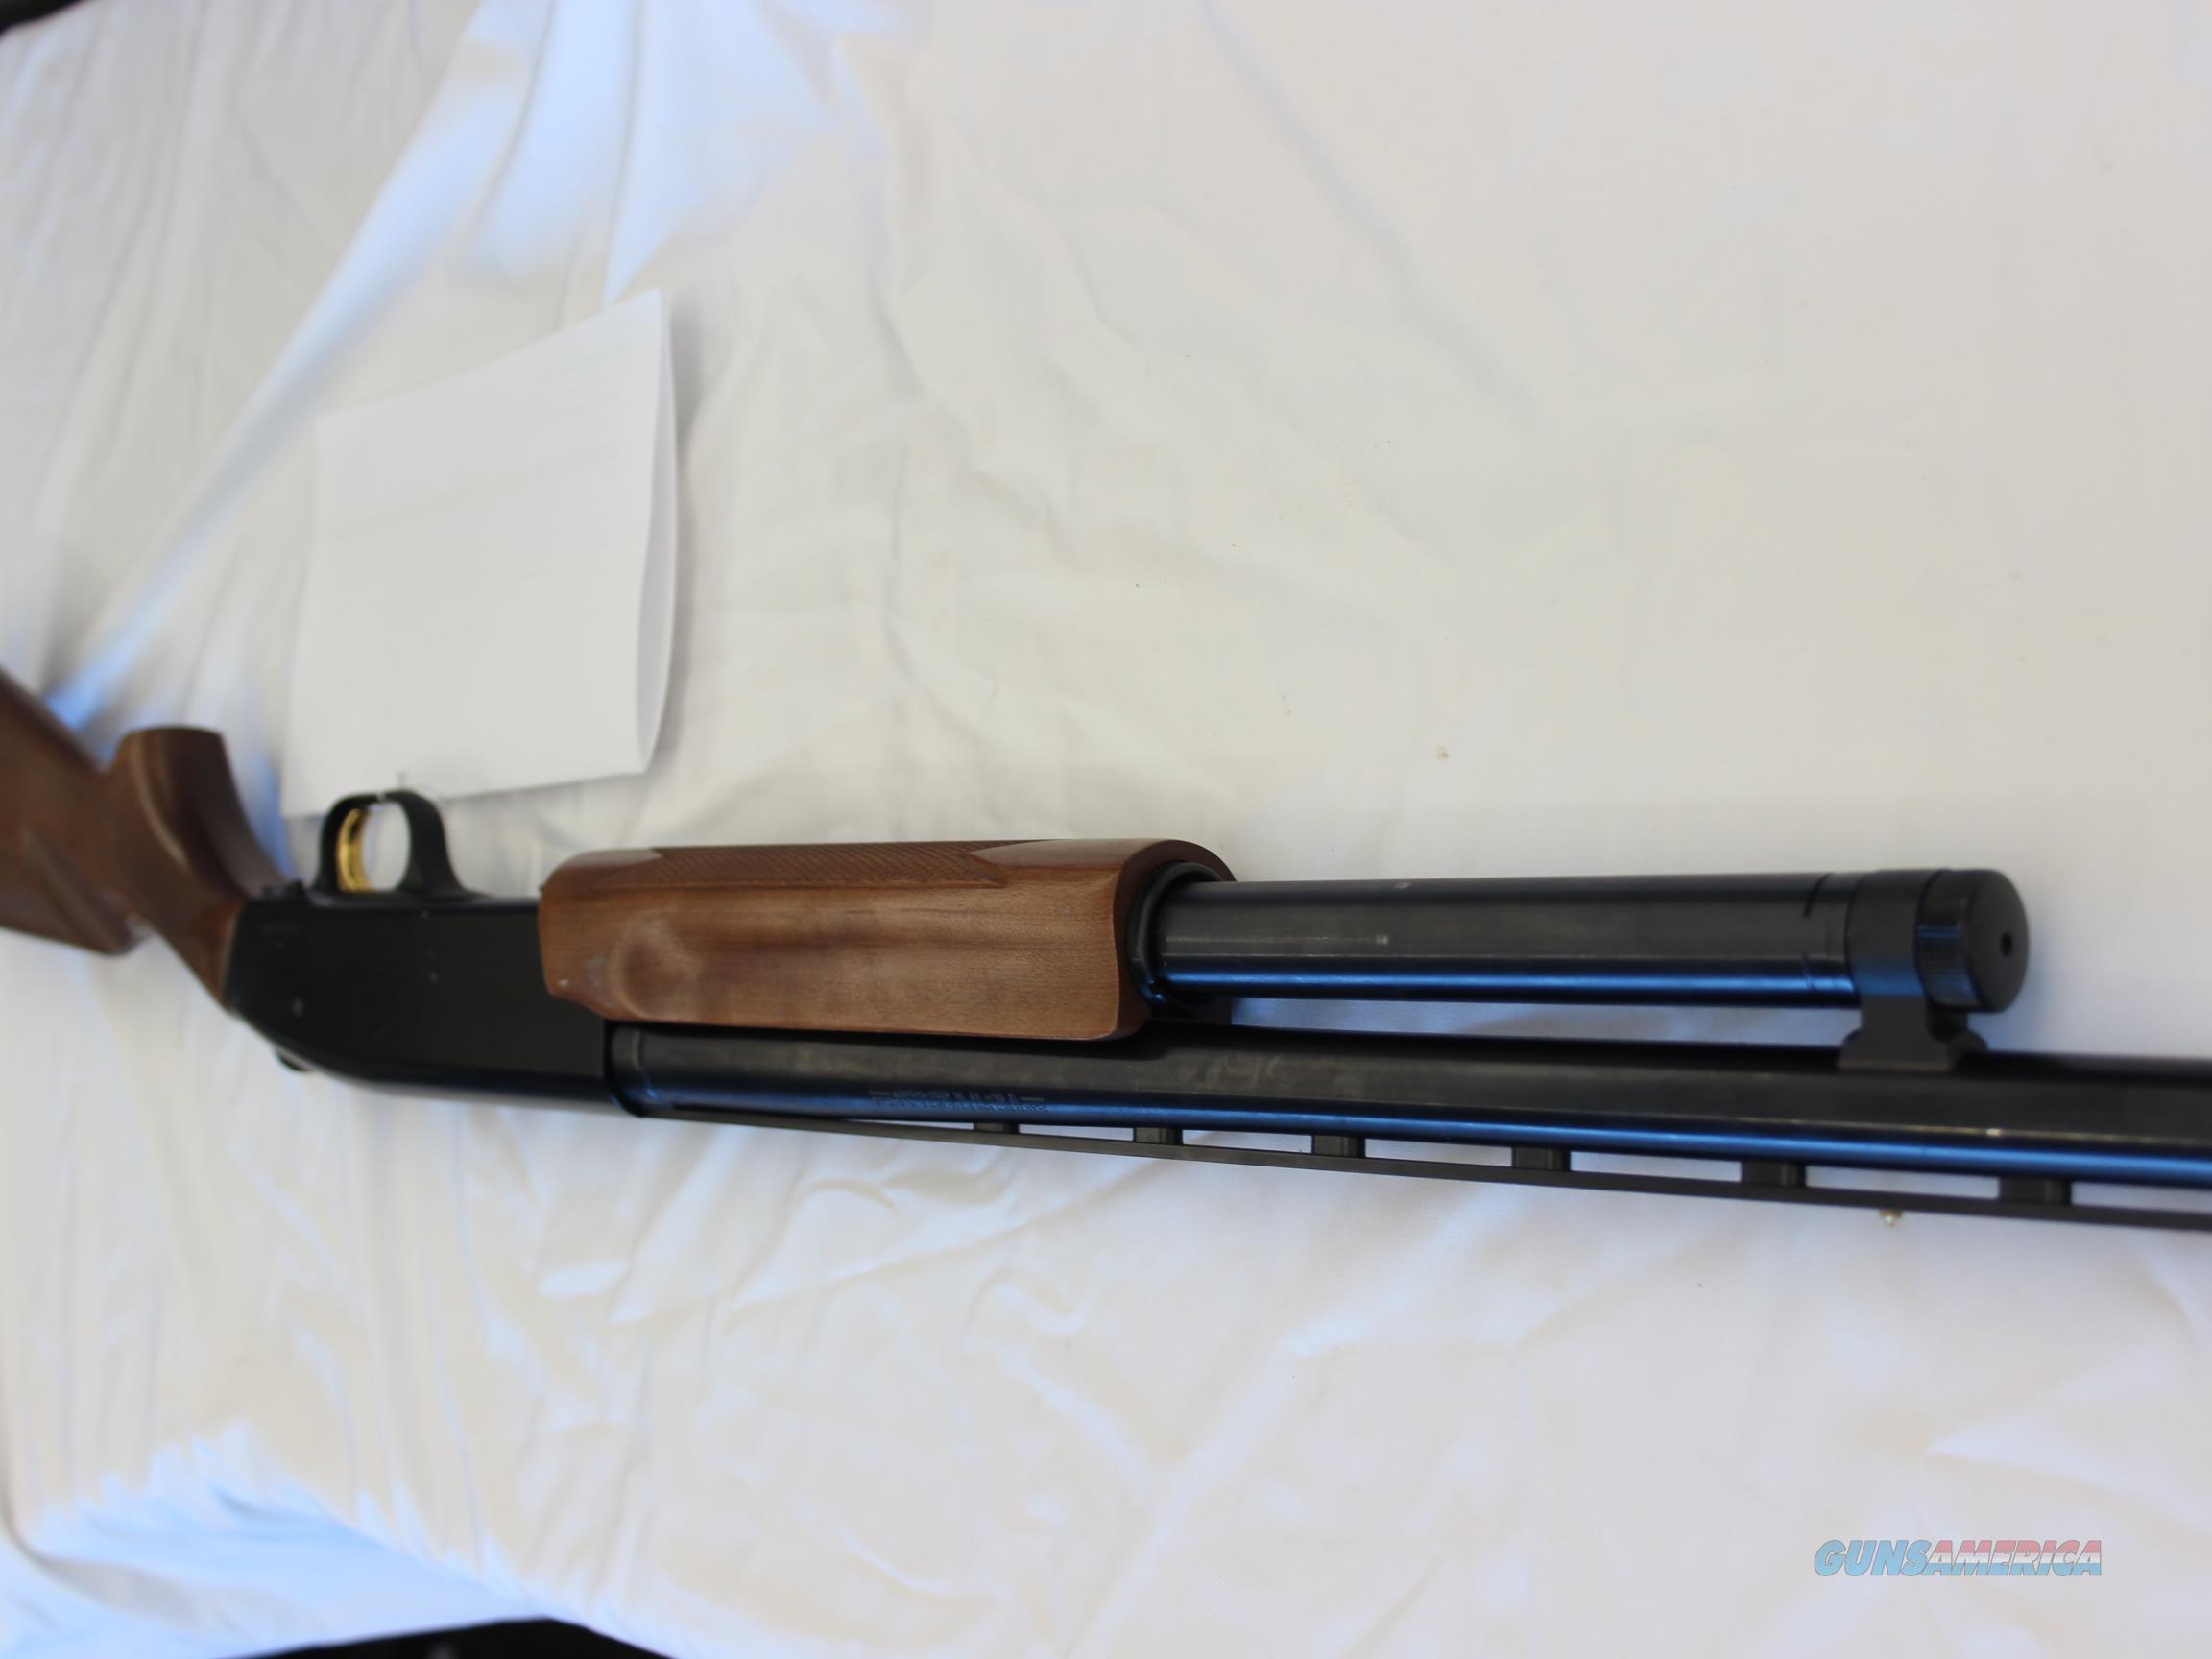 MOSSBERG 500 12 GAUGE PUMP SHOTGUN  Guns > Shotguns > Mossberg Shotguns > Pump > Sporting